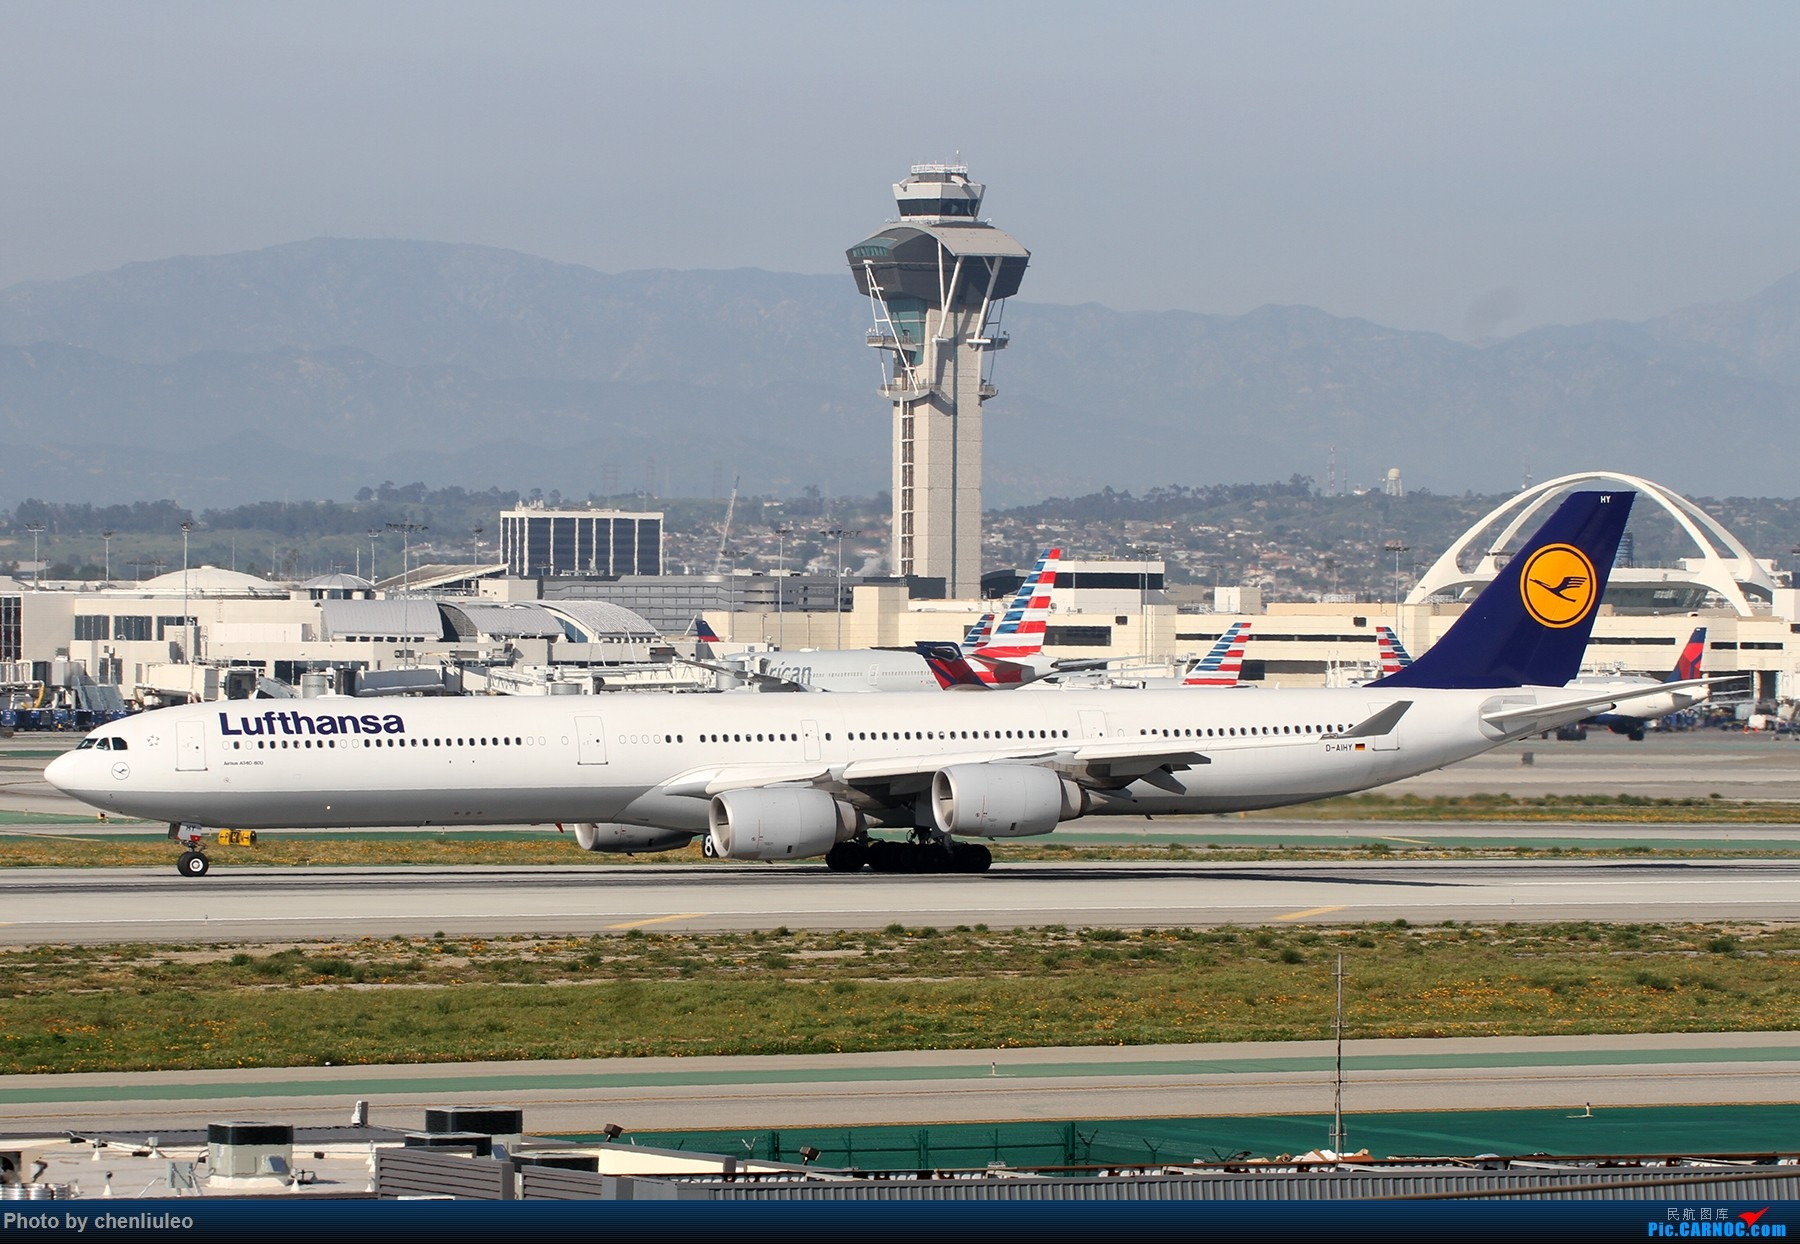 Re:[原创]【北美飞友会】全日空星球大战BB-8黄昏中降落LAX 以及一些杂图 AIRBUS A340-600 D-AIHY 美国洛杉矶机场